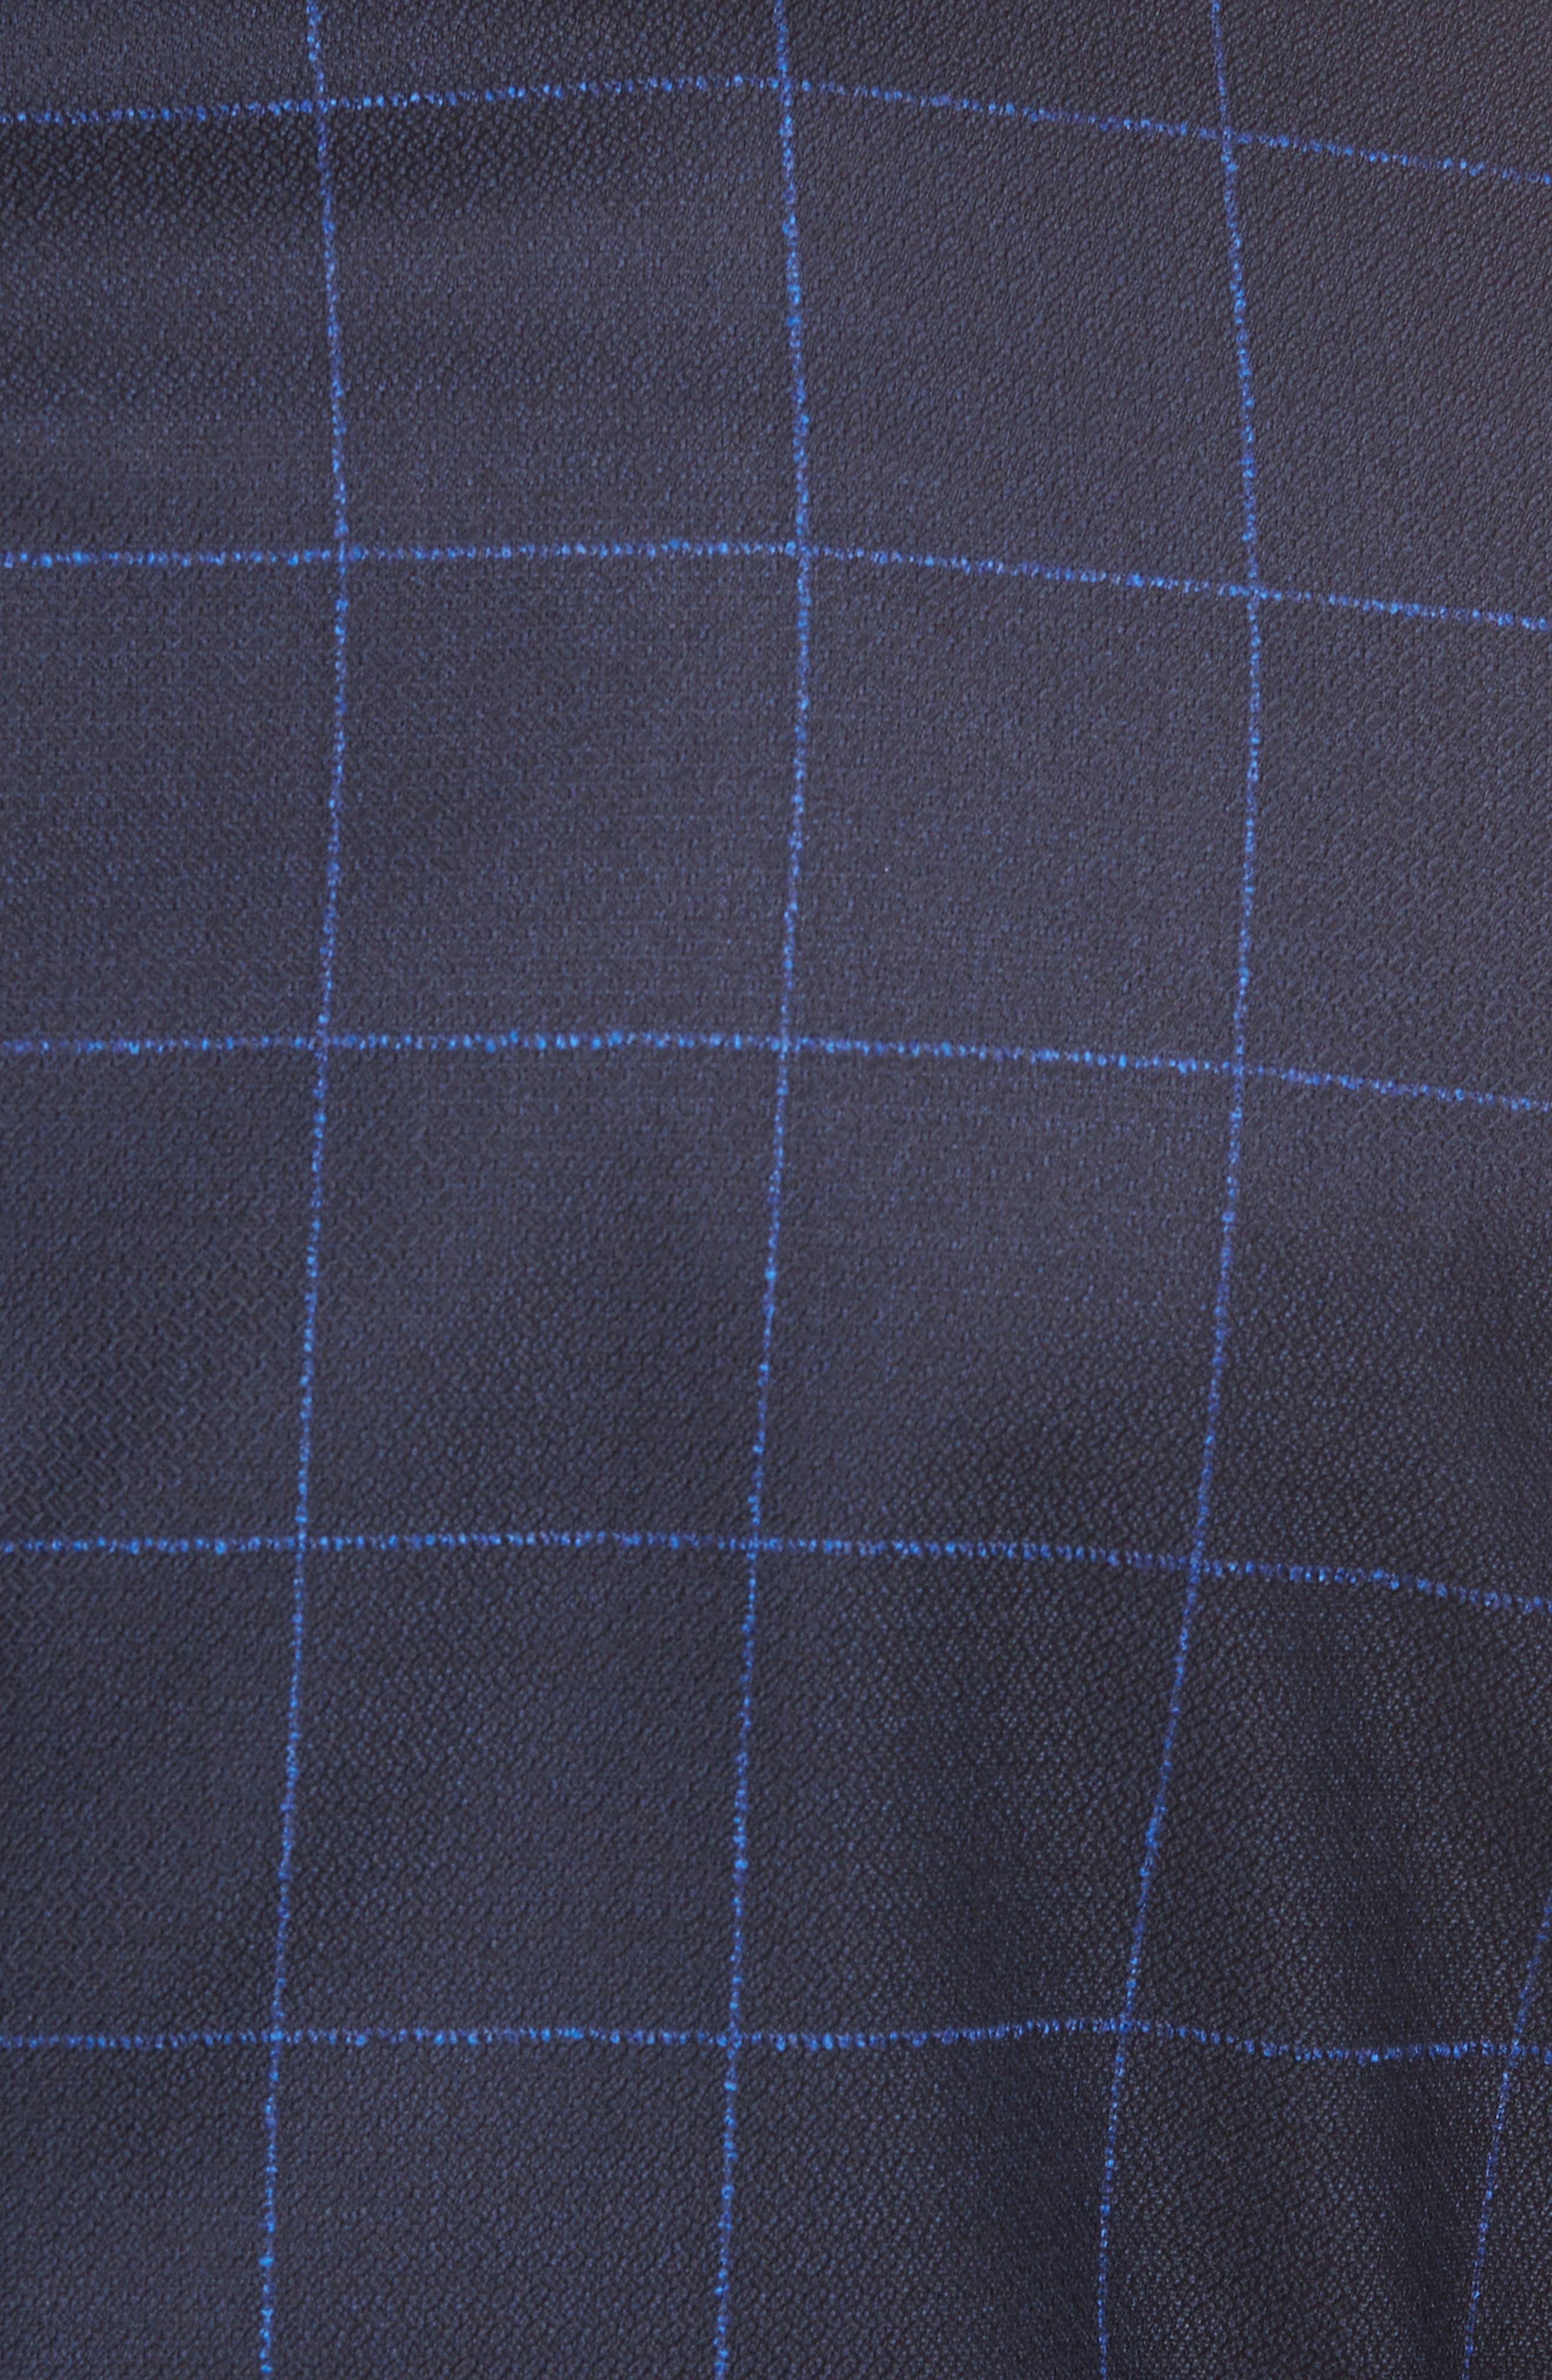 Nordstrom x BOSS Nobis Trim Fit Check Wool Sport Coat,                             Alternate thumbnail 6, color,